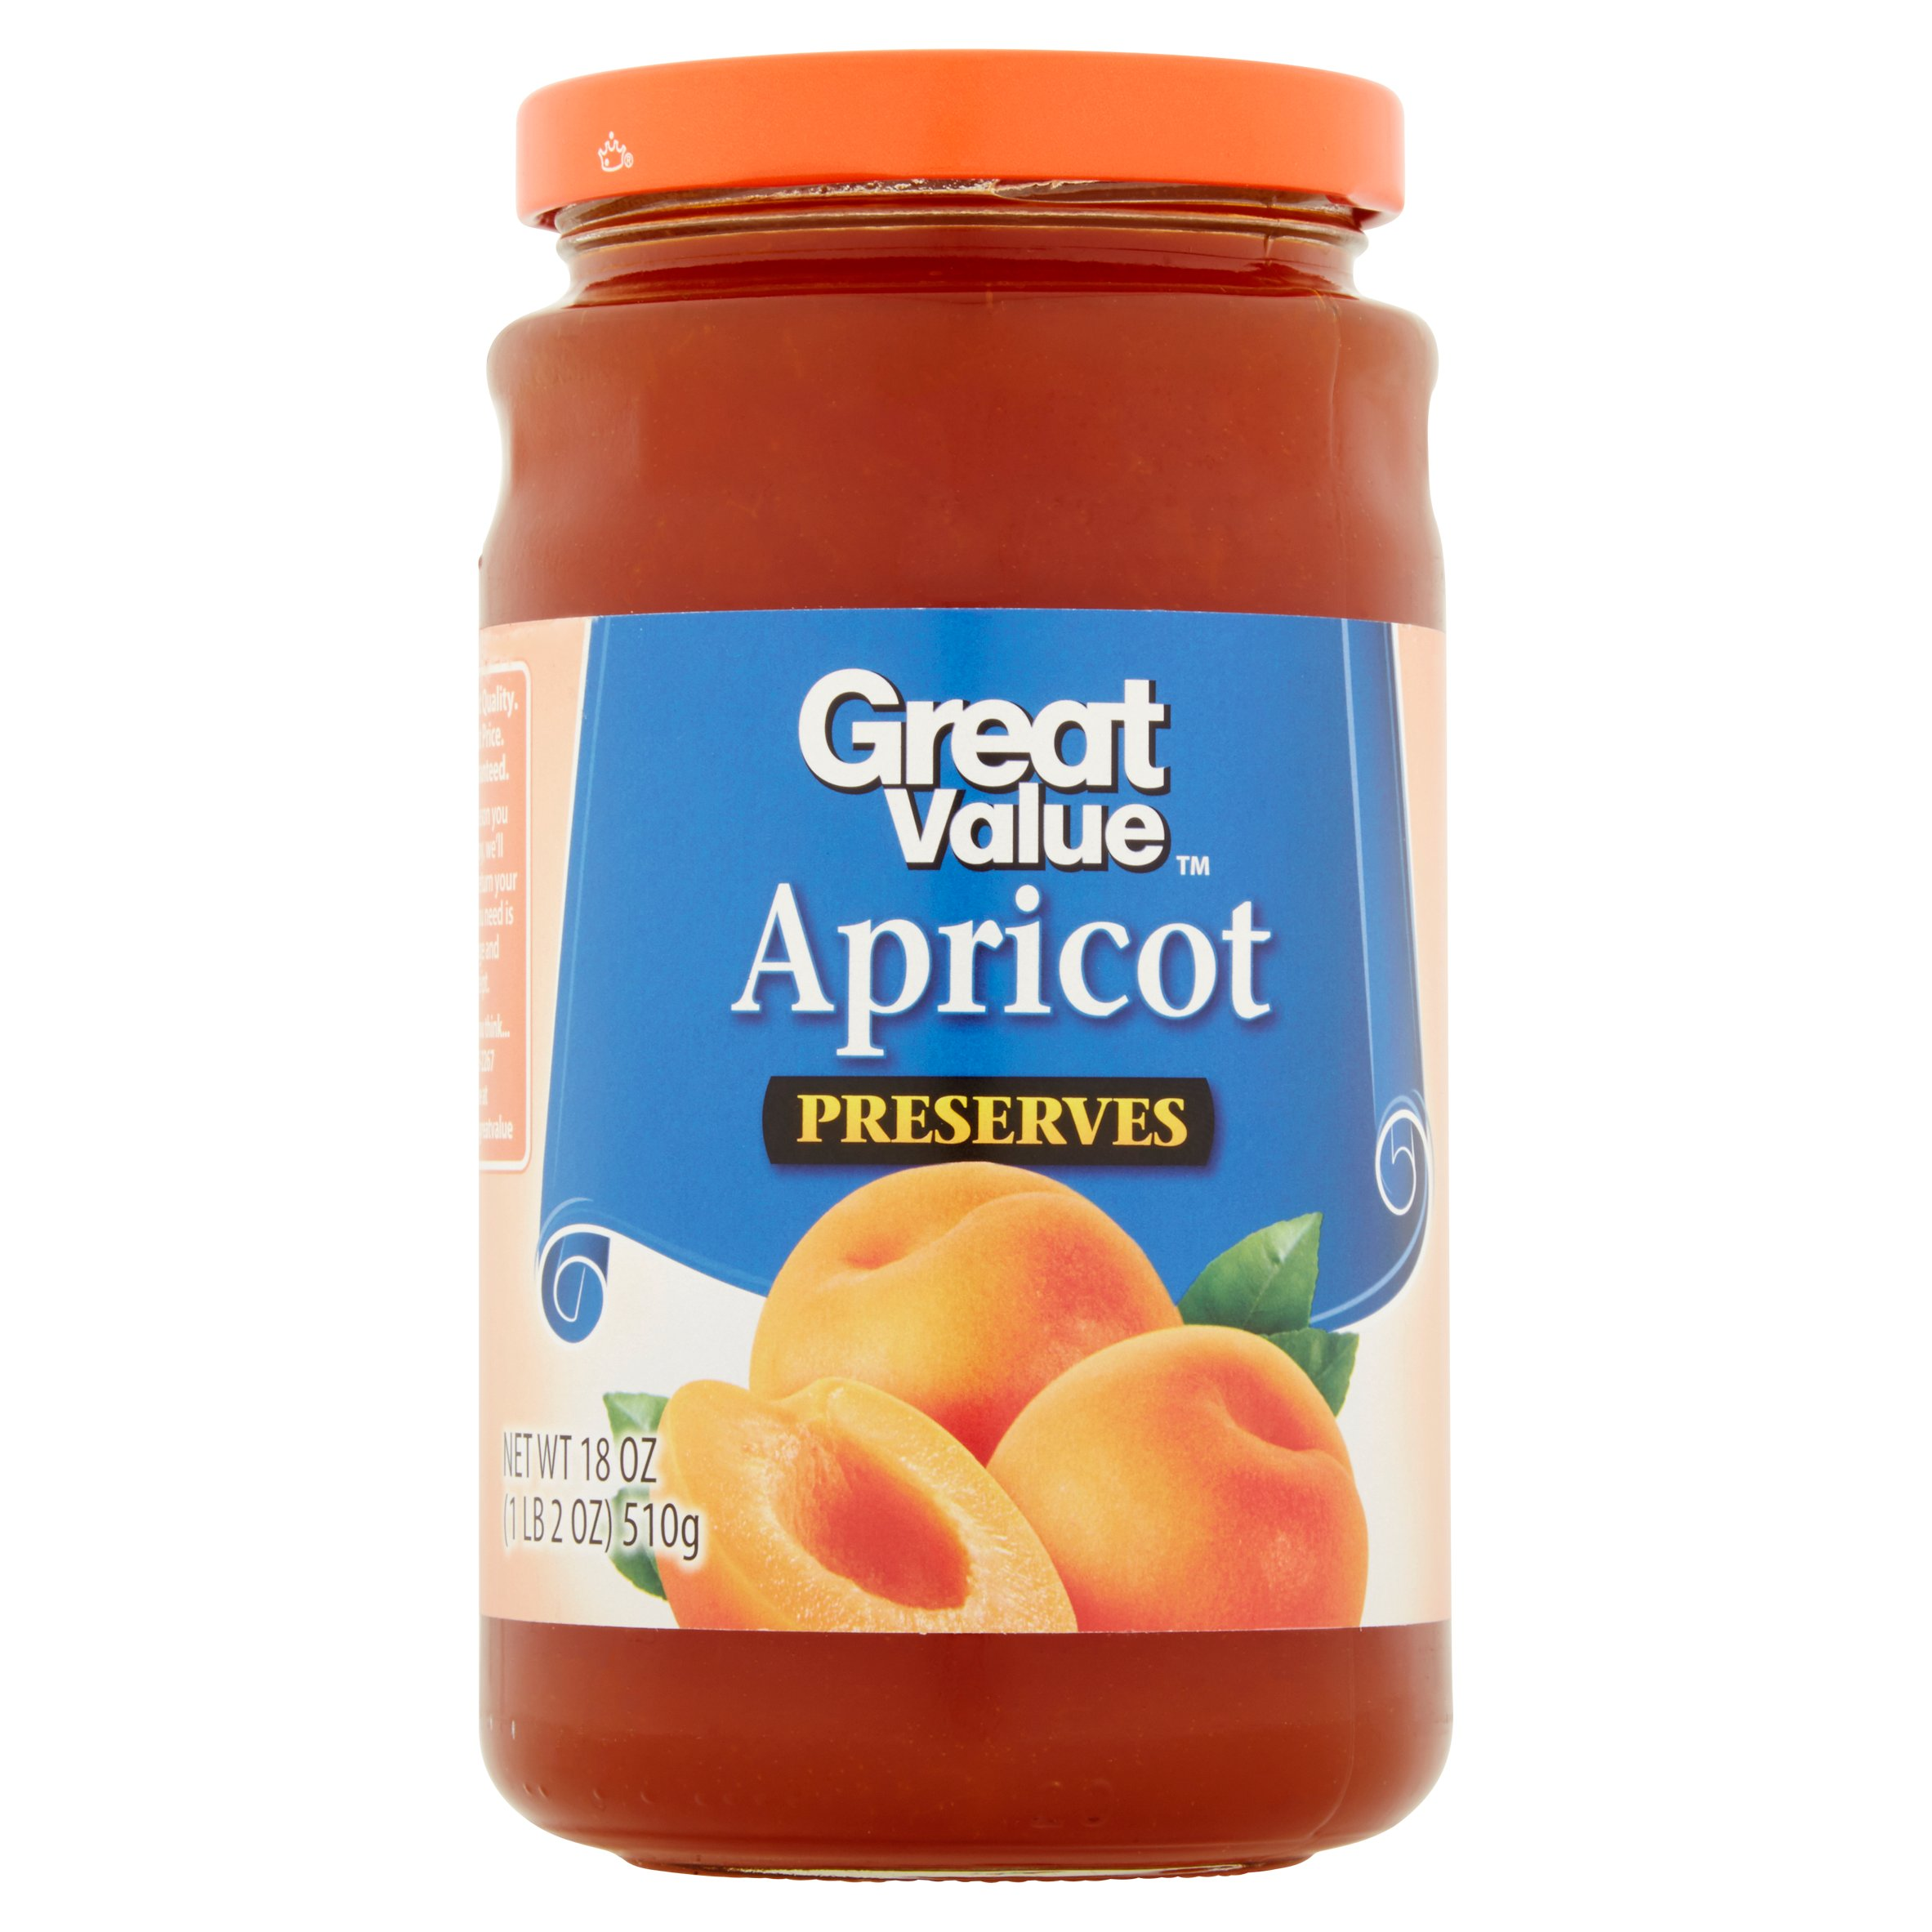 Great Value Apricot Preserves, 18 oz